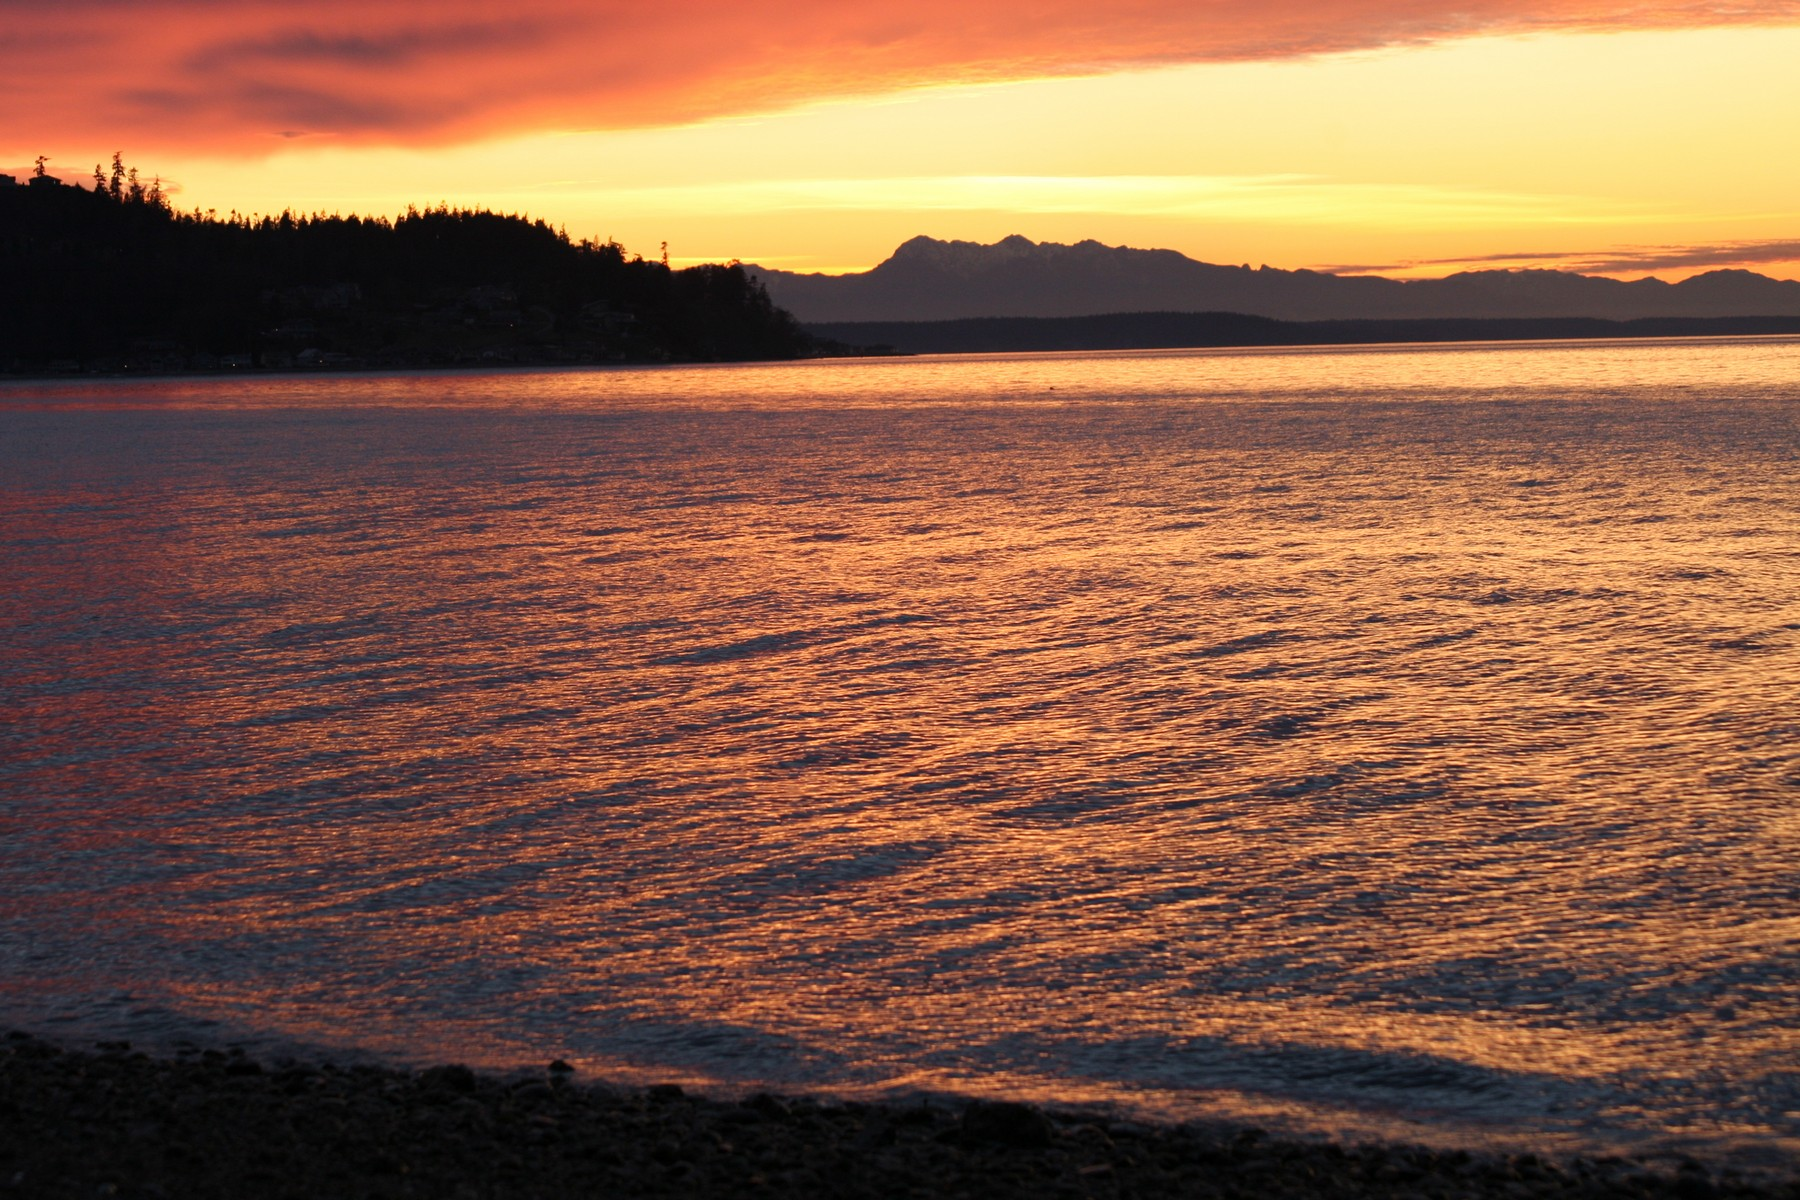 Single Family Home for Sale at 365 Arrowhead Beach Rd, Camano Island 98282-8711 Camano Island, Washington 98282 United States